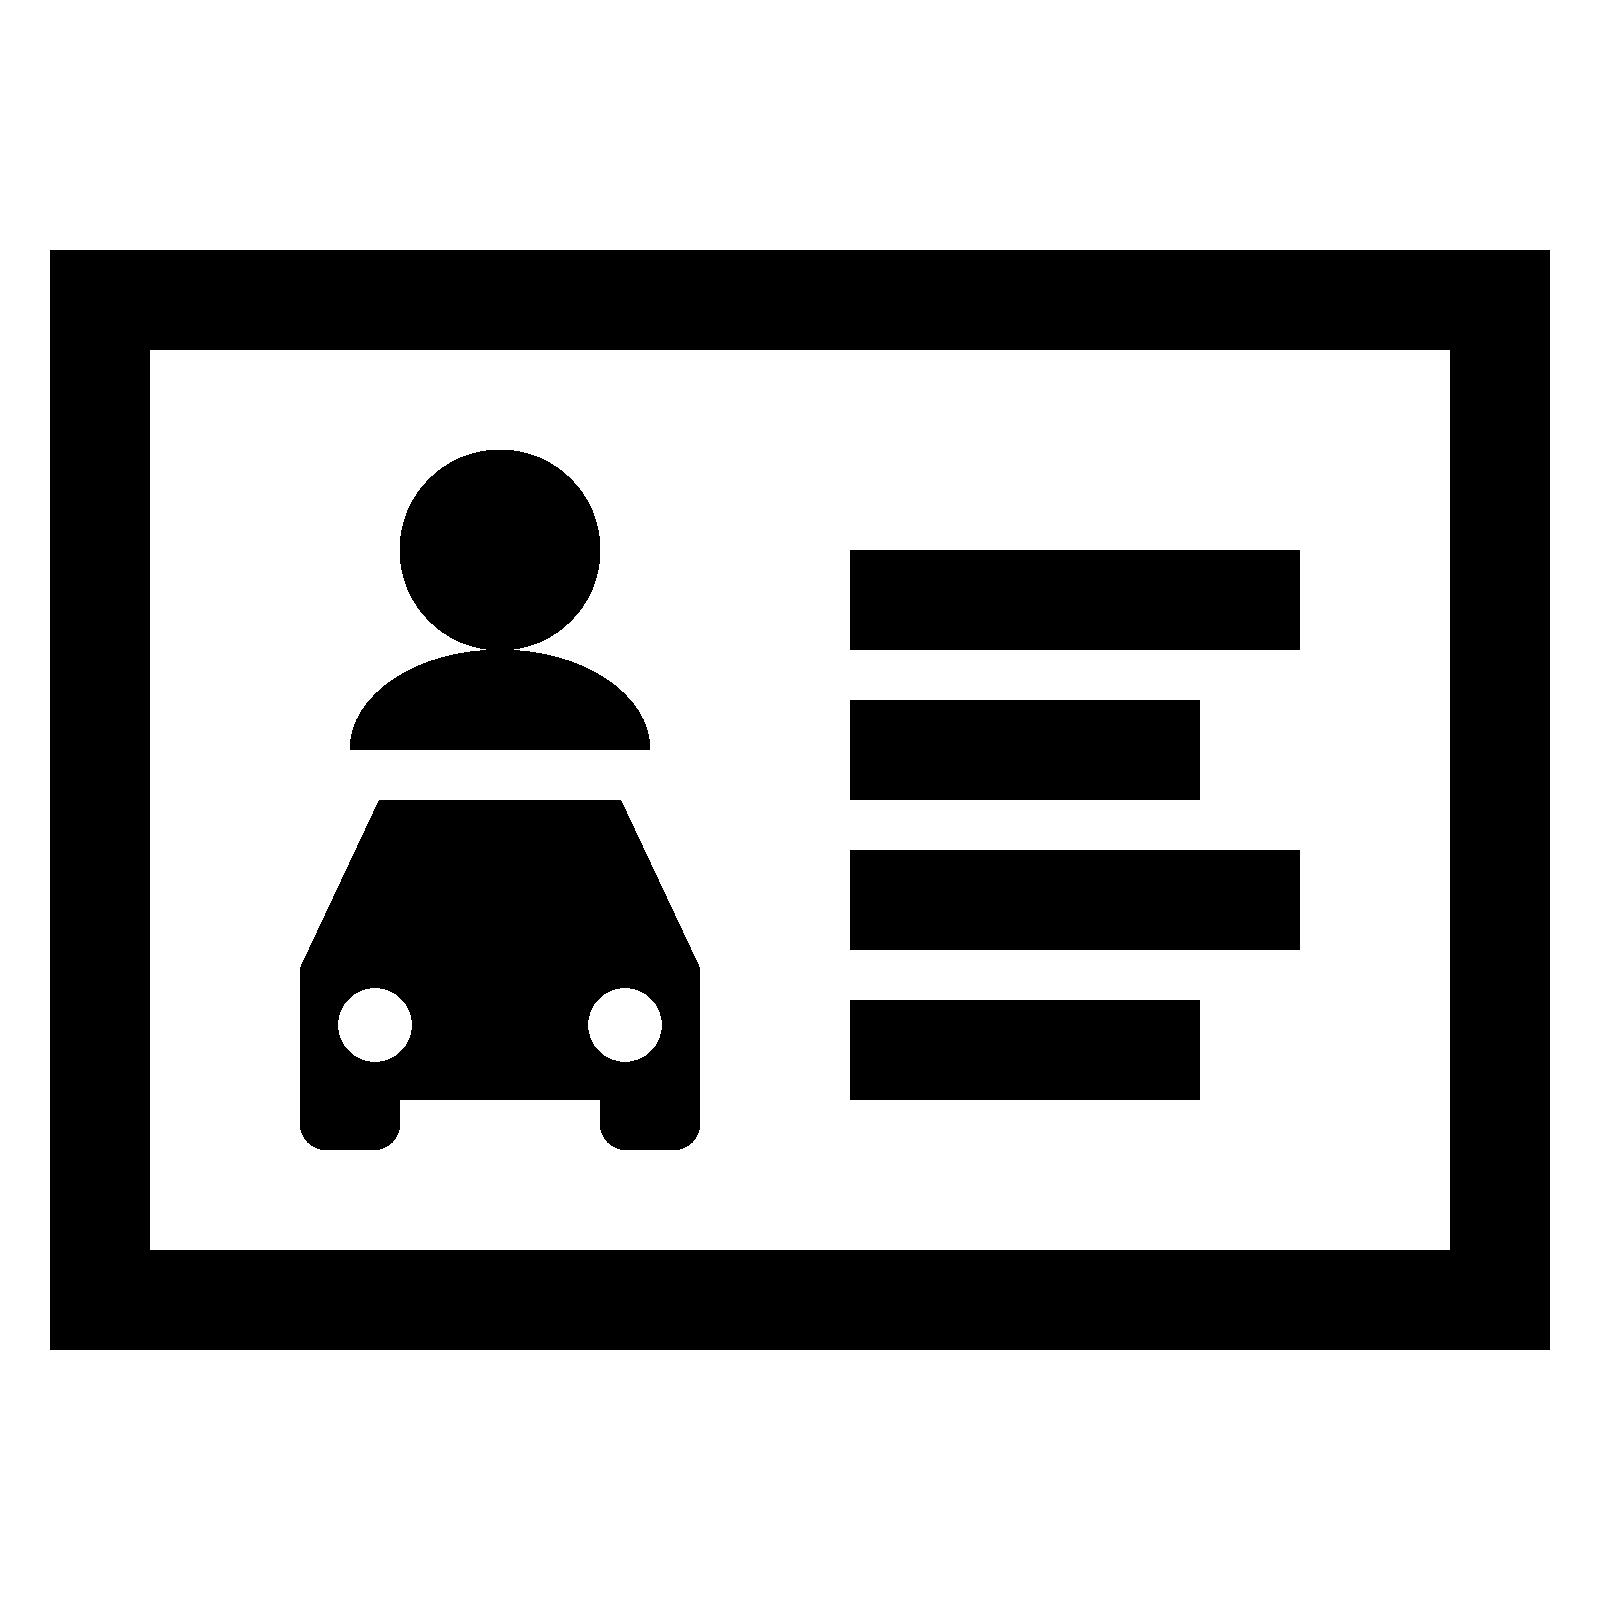 Haus bellevue . Drivers license clipart valid driver